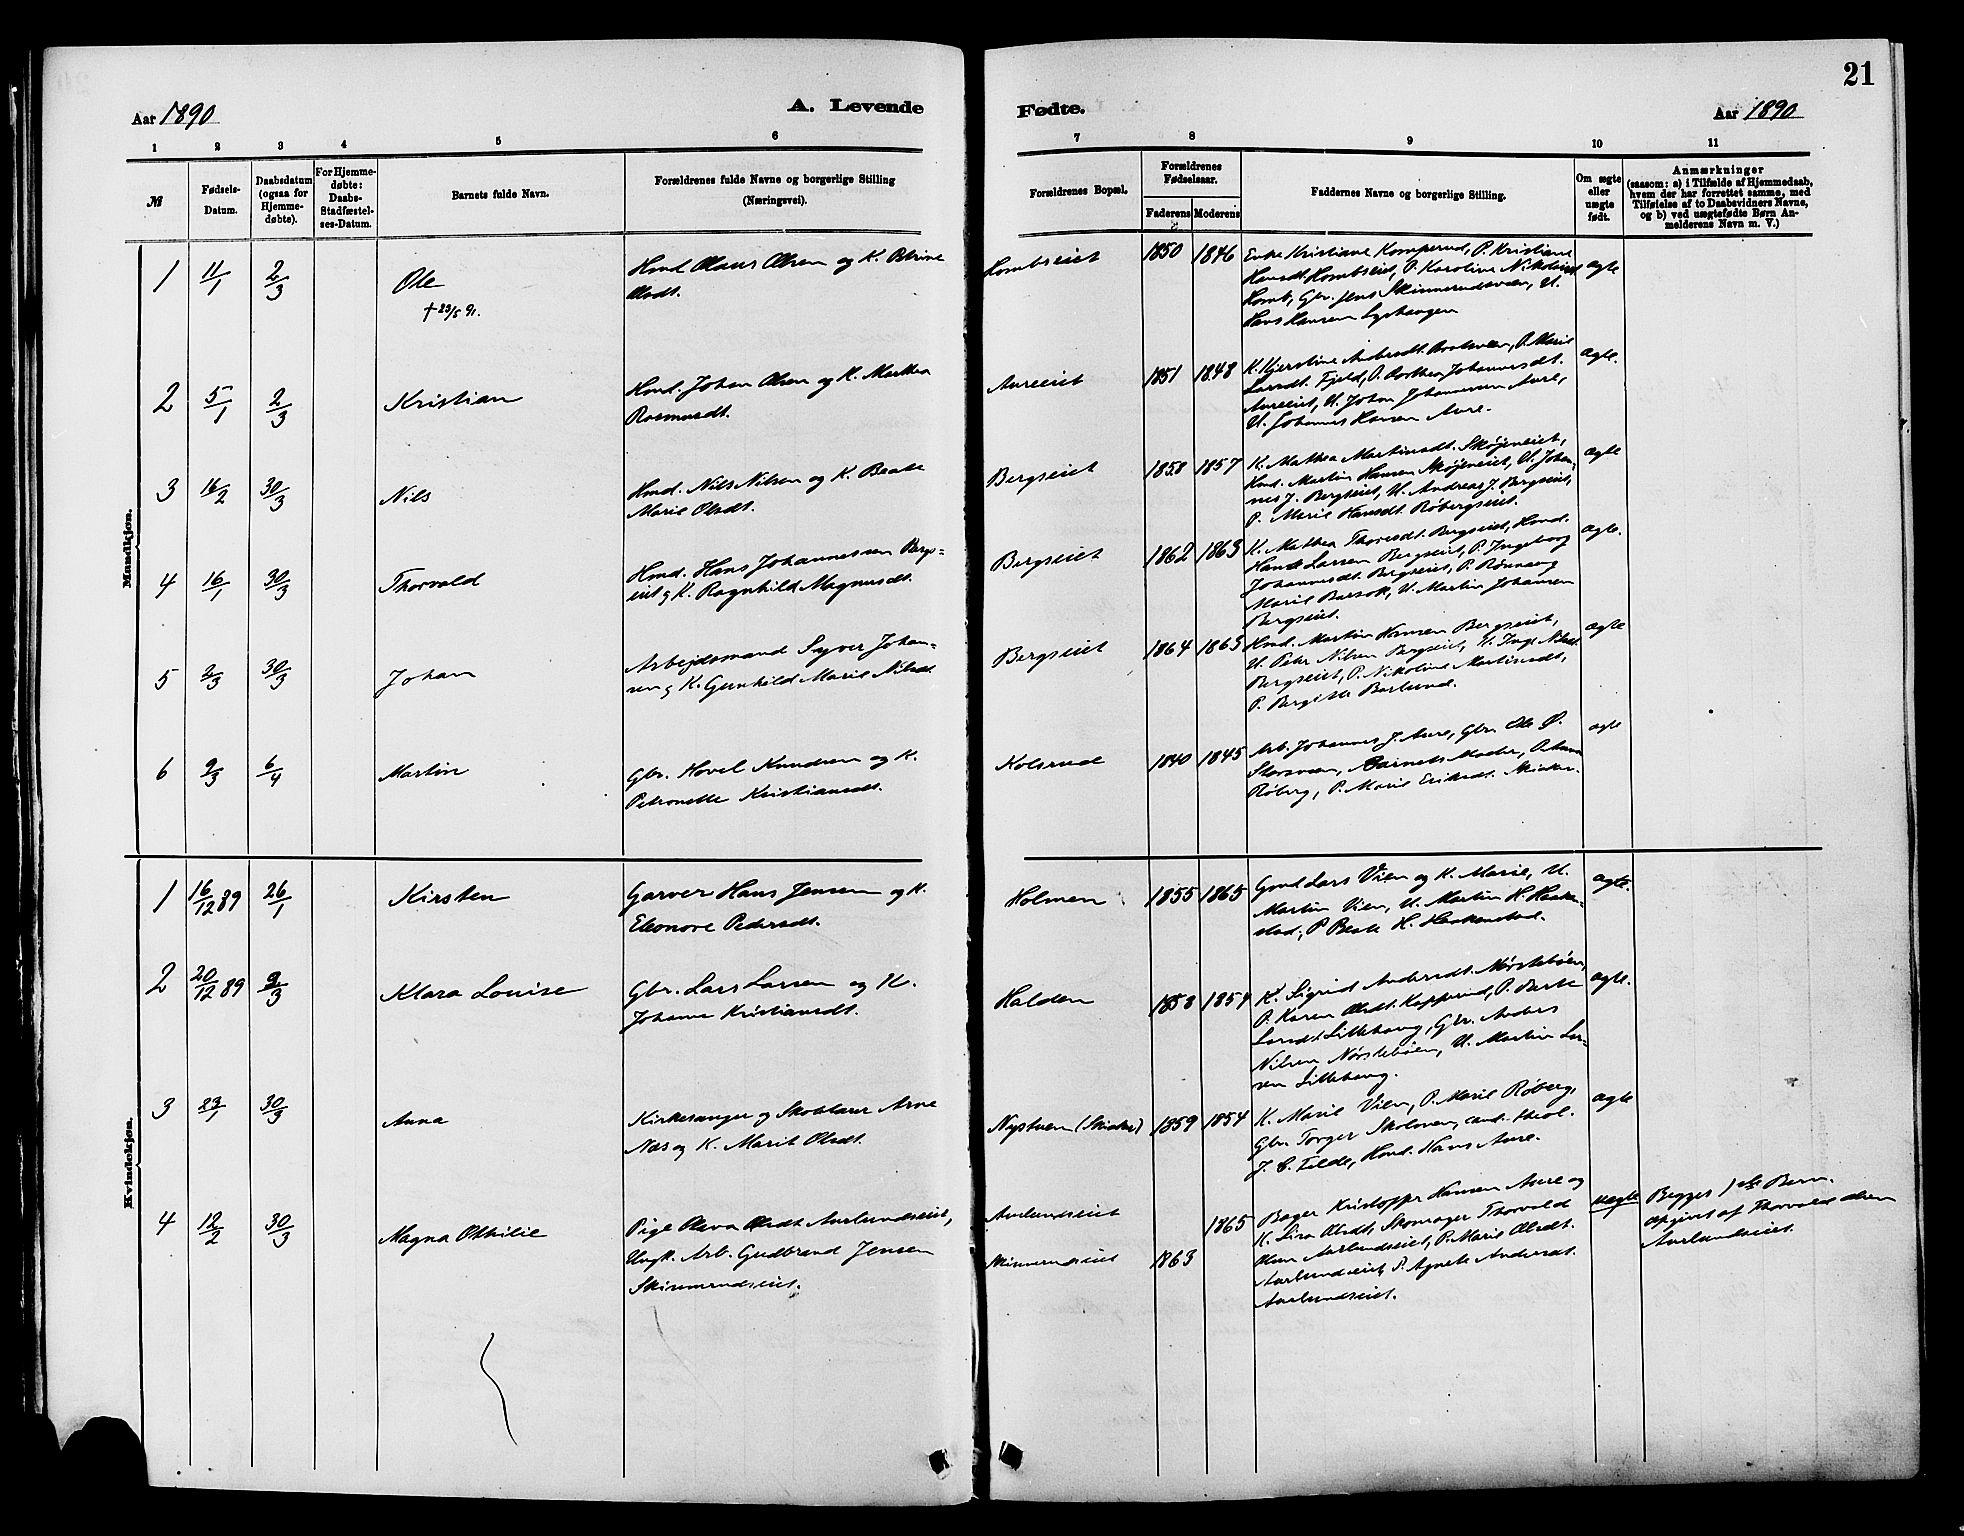 SAH, Nordre Land prestekontor, Ministerialbok nr. 3, 1882-1896, s. 21